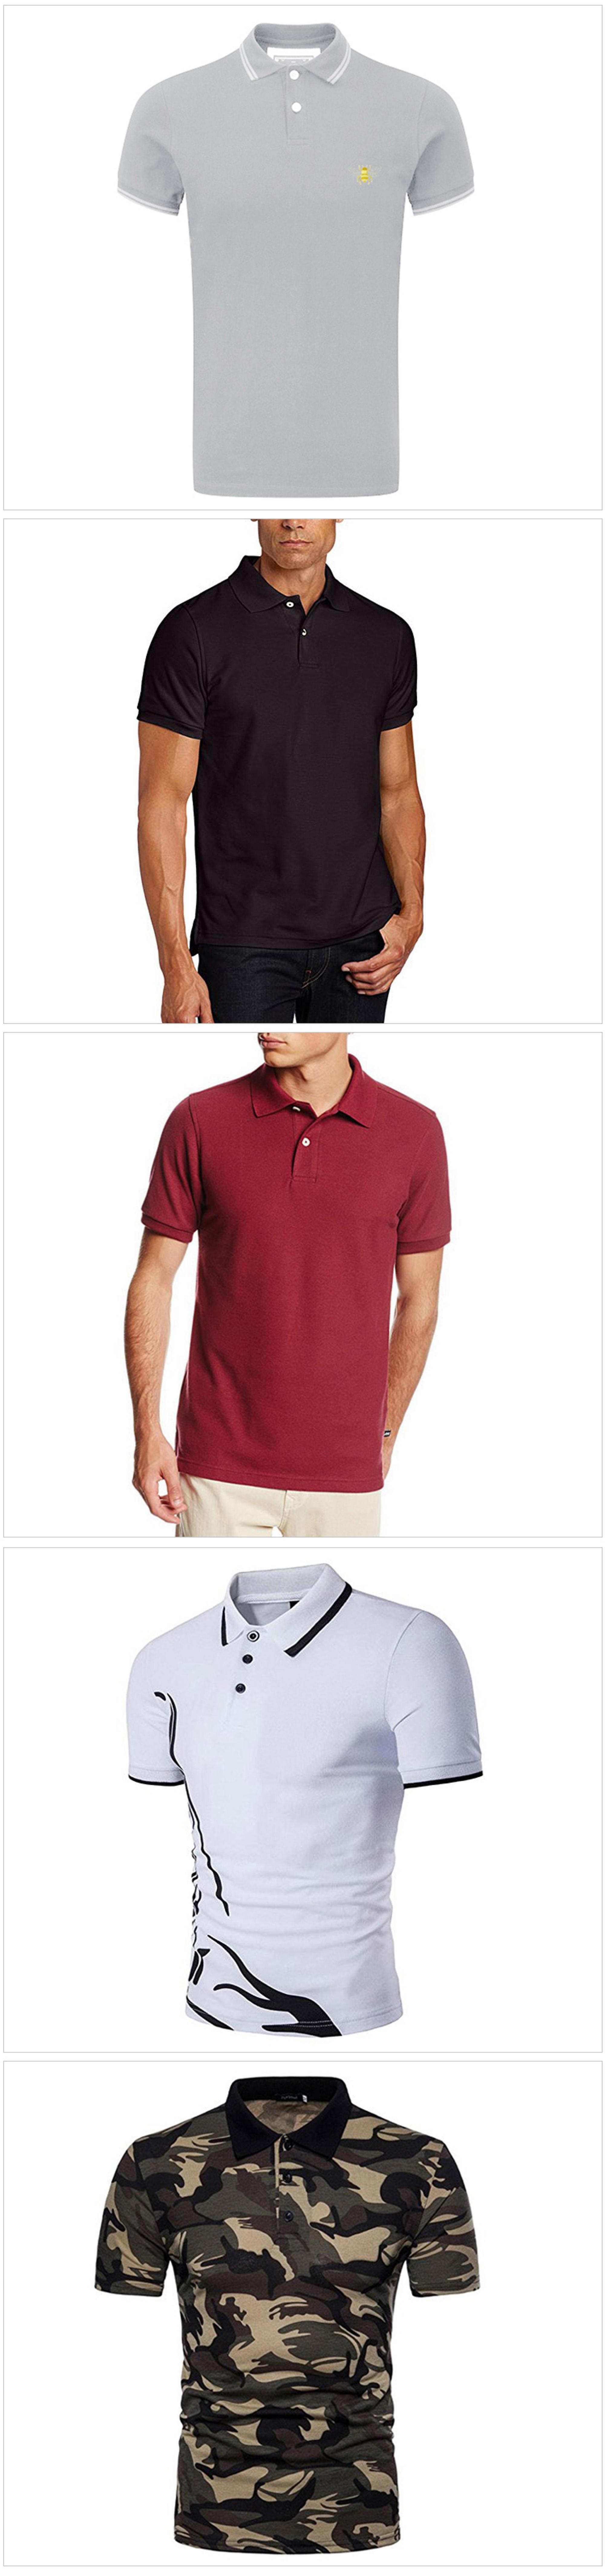 ee5c24747 2019 Top Quality Men polo T Shirt design, Wholesale Custom Mens 100% cotton  golf